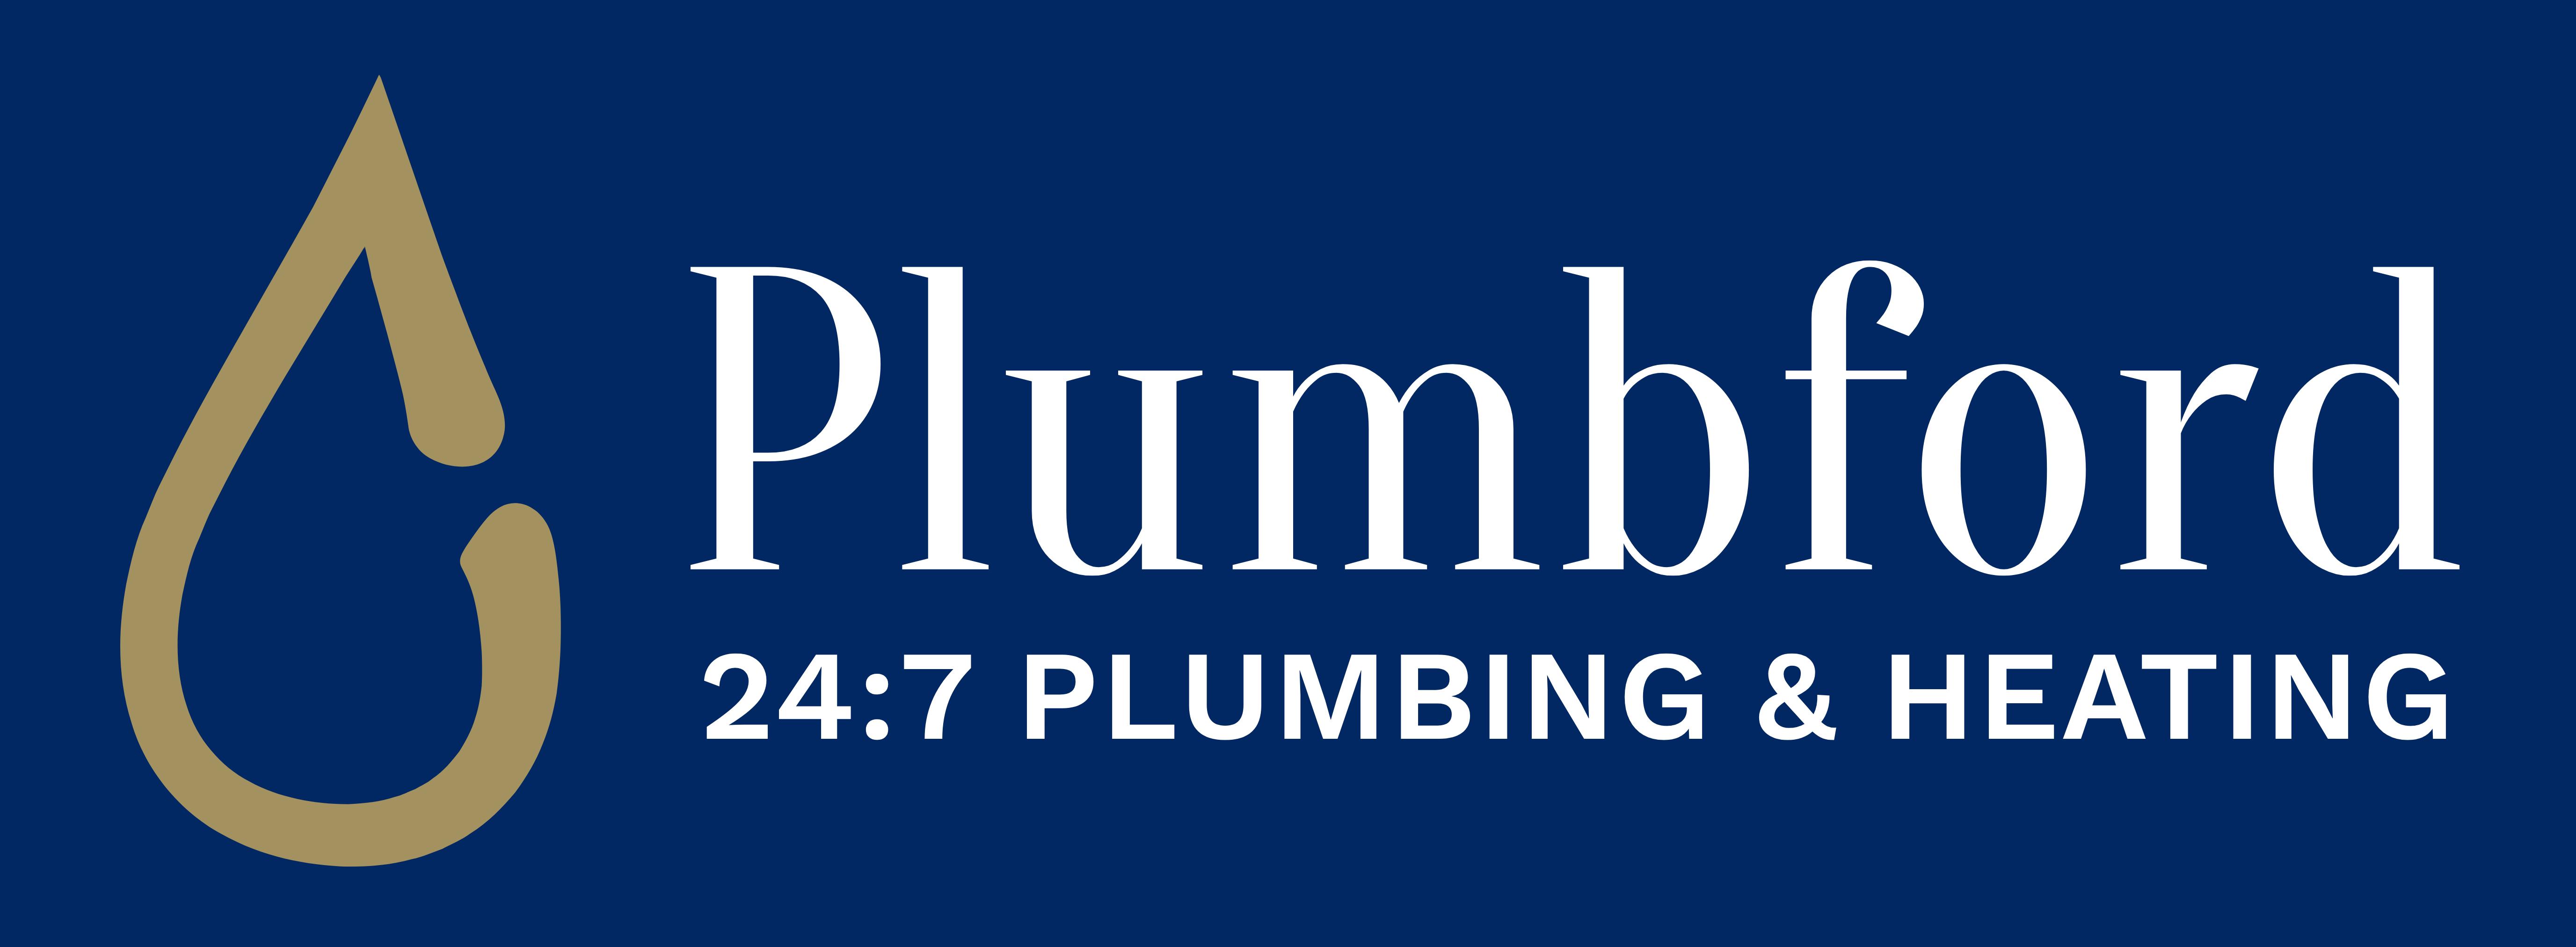 Plumbford 24/7 Plumbing & Heating Service